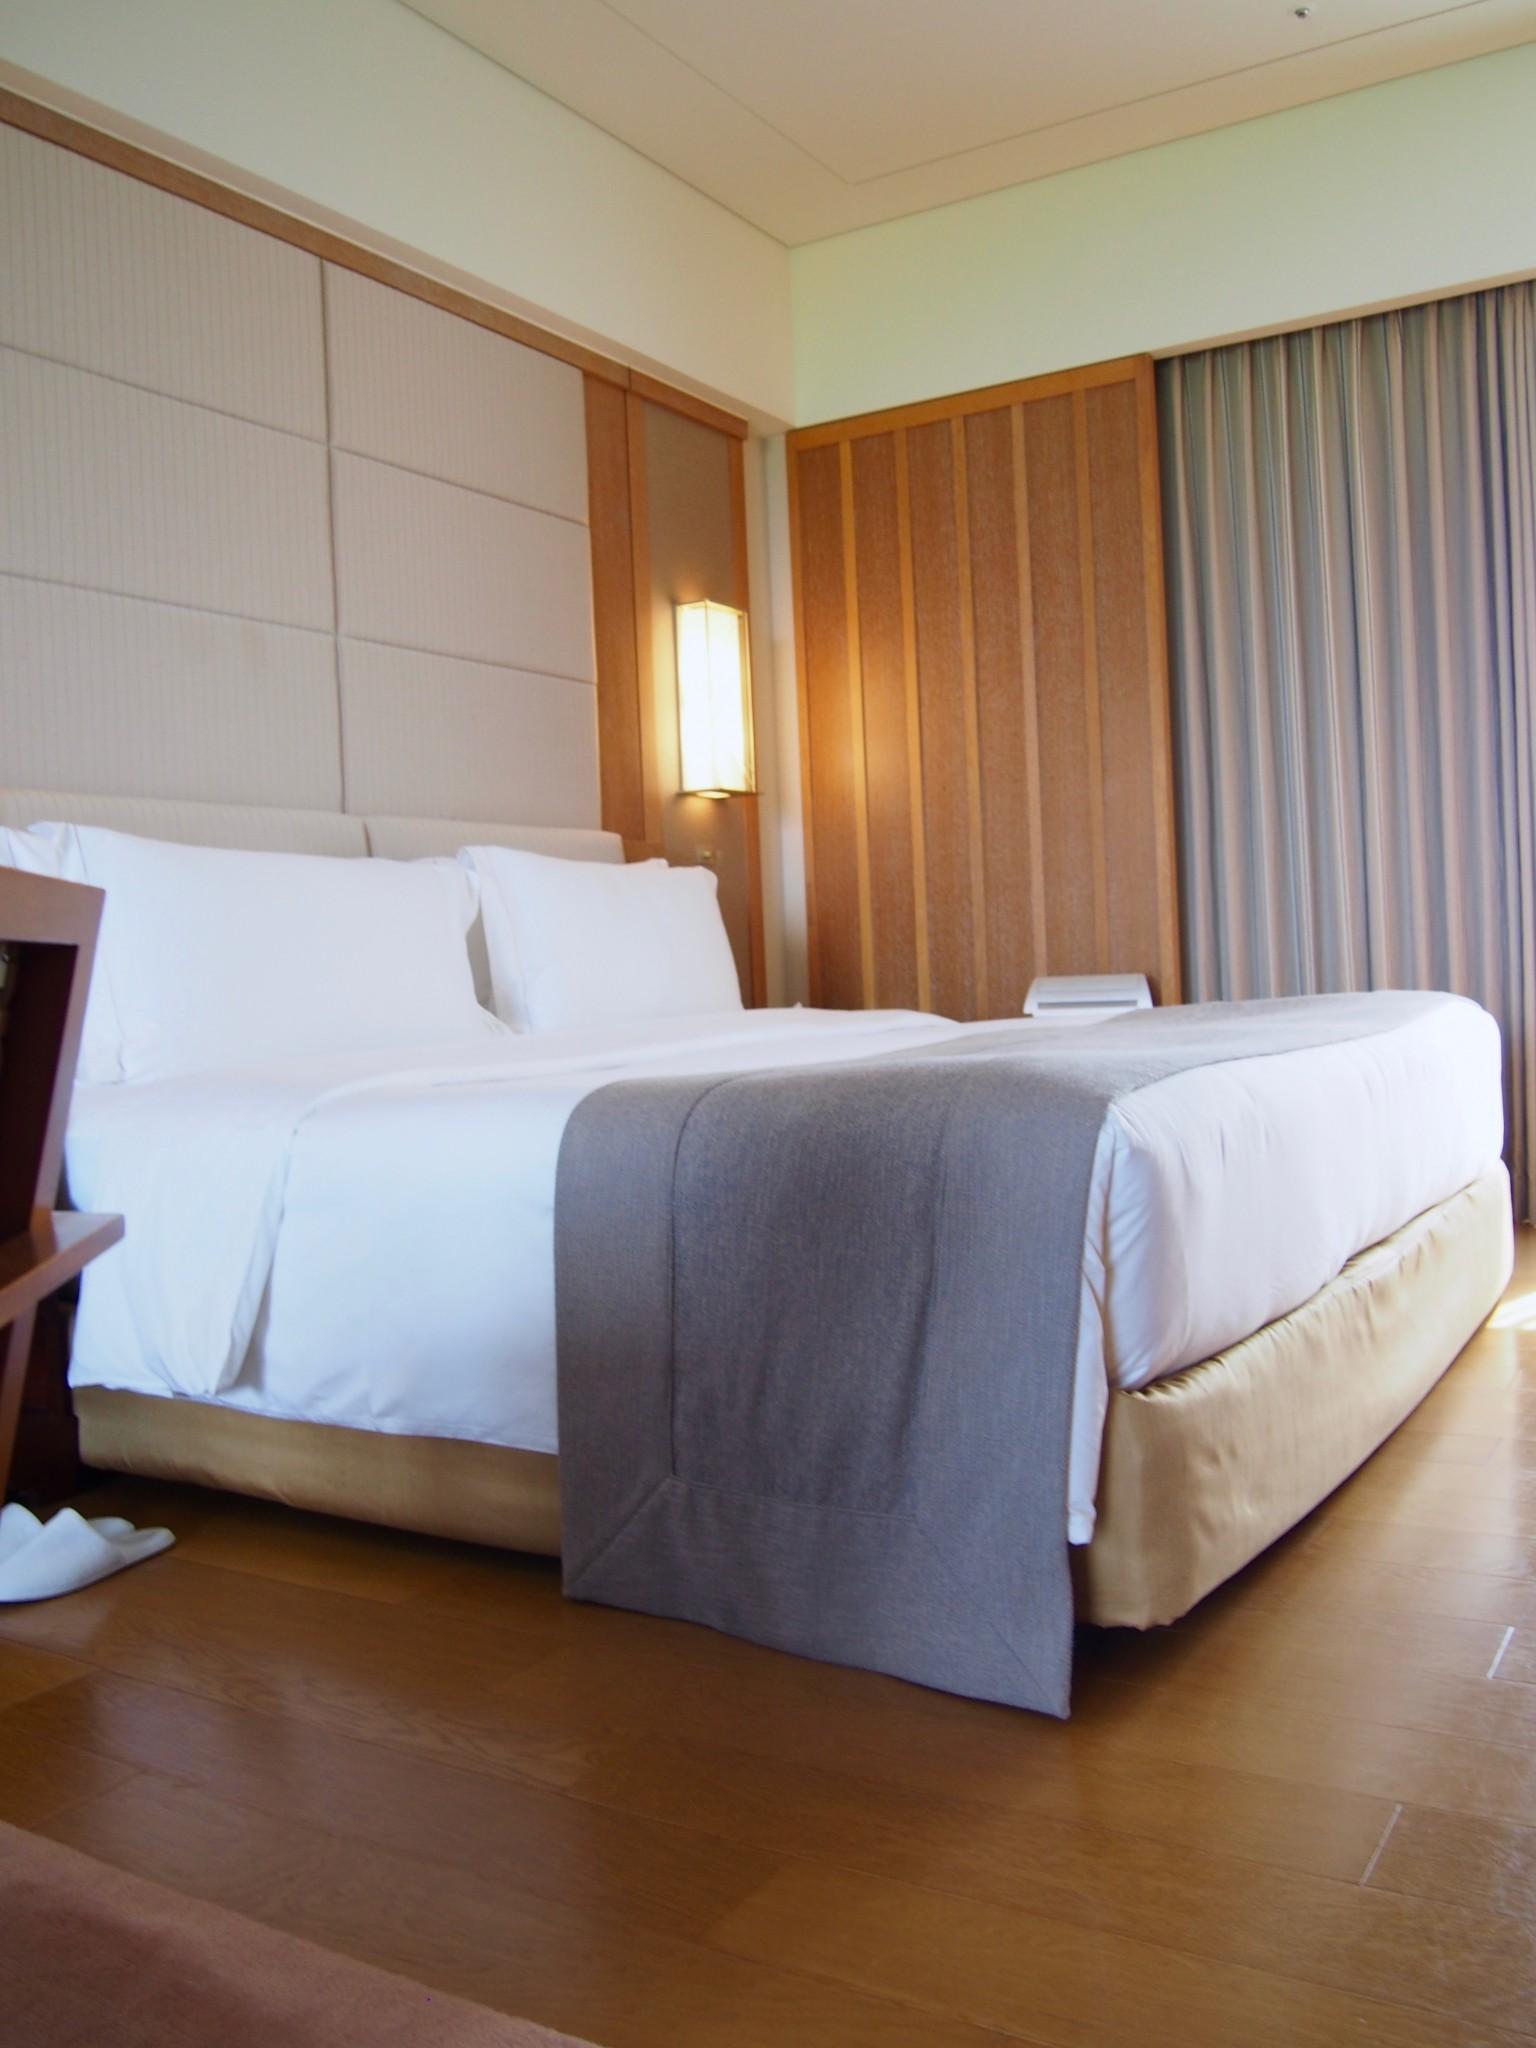 Ritz-Carlton Okinawa makuuhuone 2